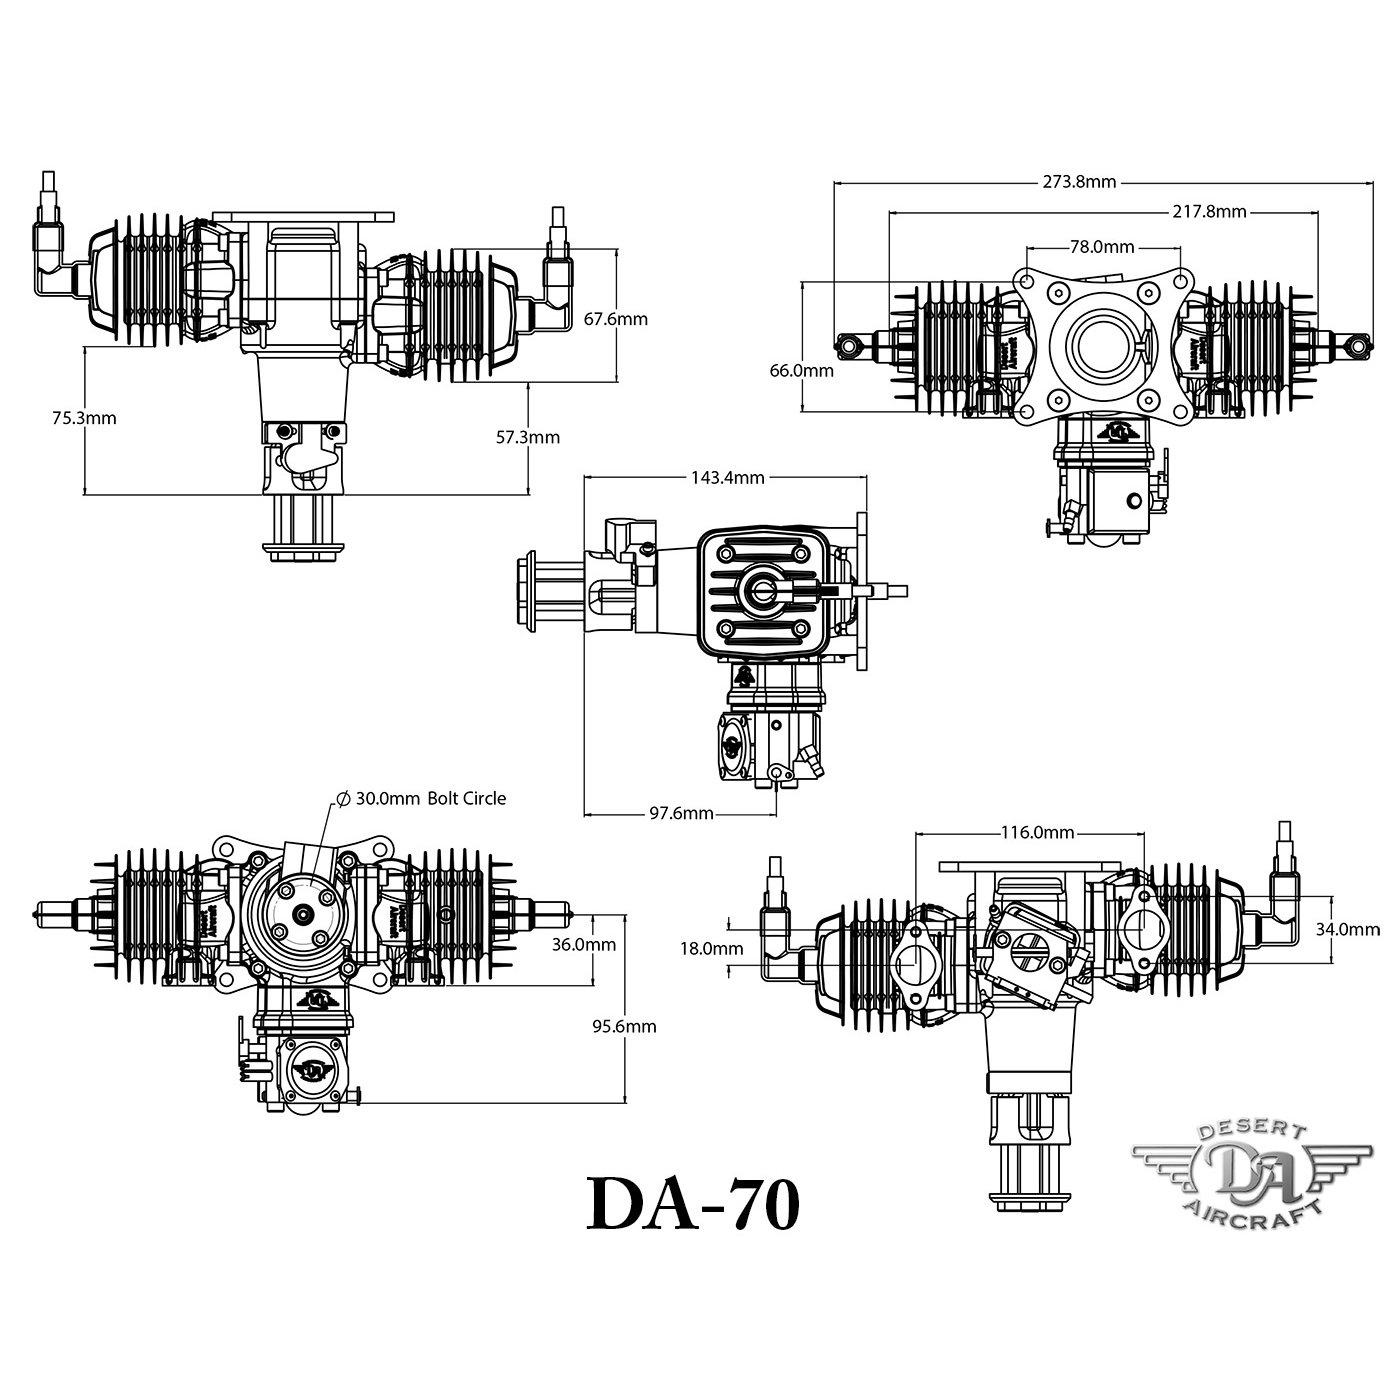 hight resolution of 70cc engine diagram 10 10 tridonicsignage de u202270cc engine diagram best wiring library rh 106